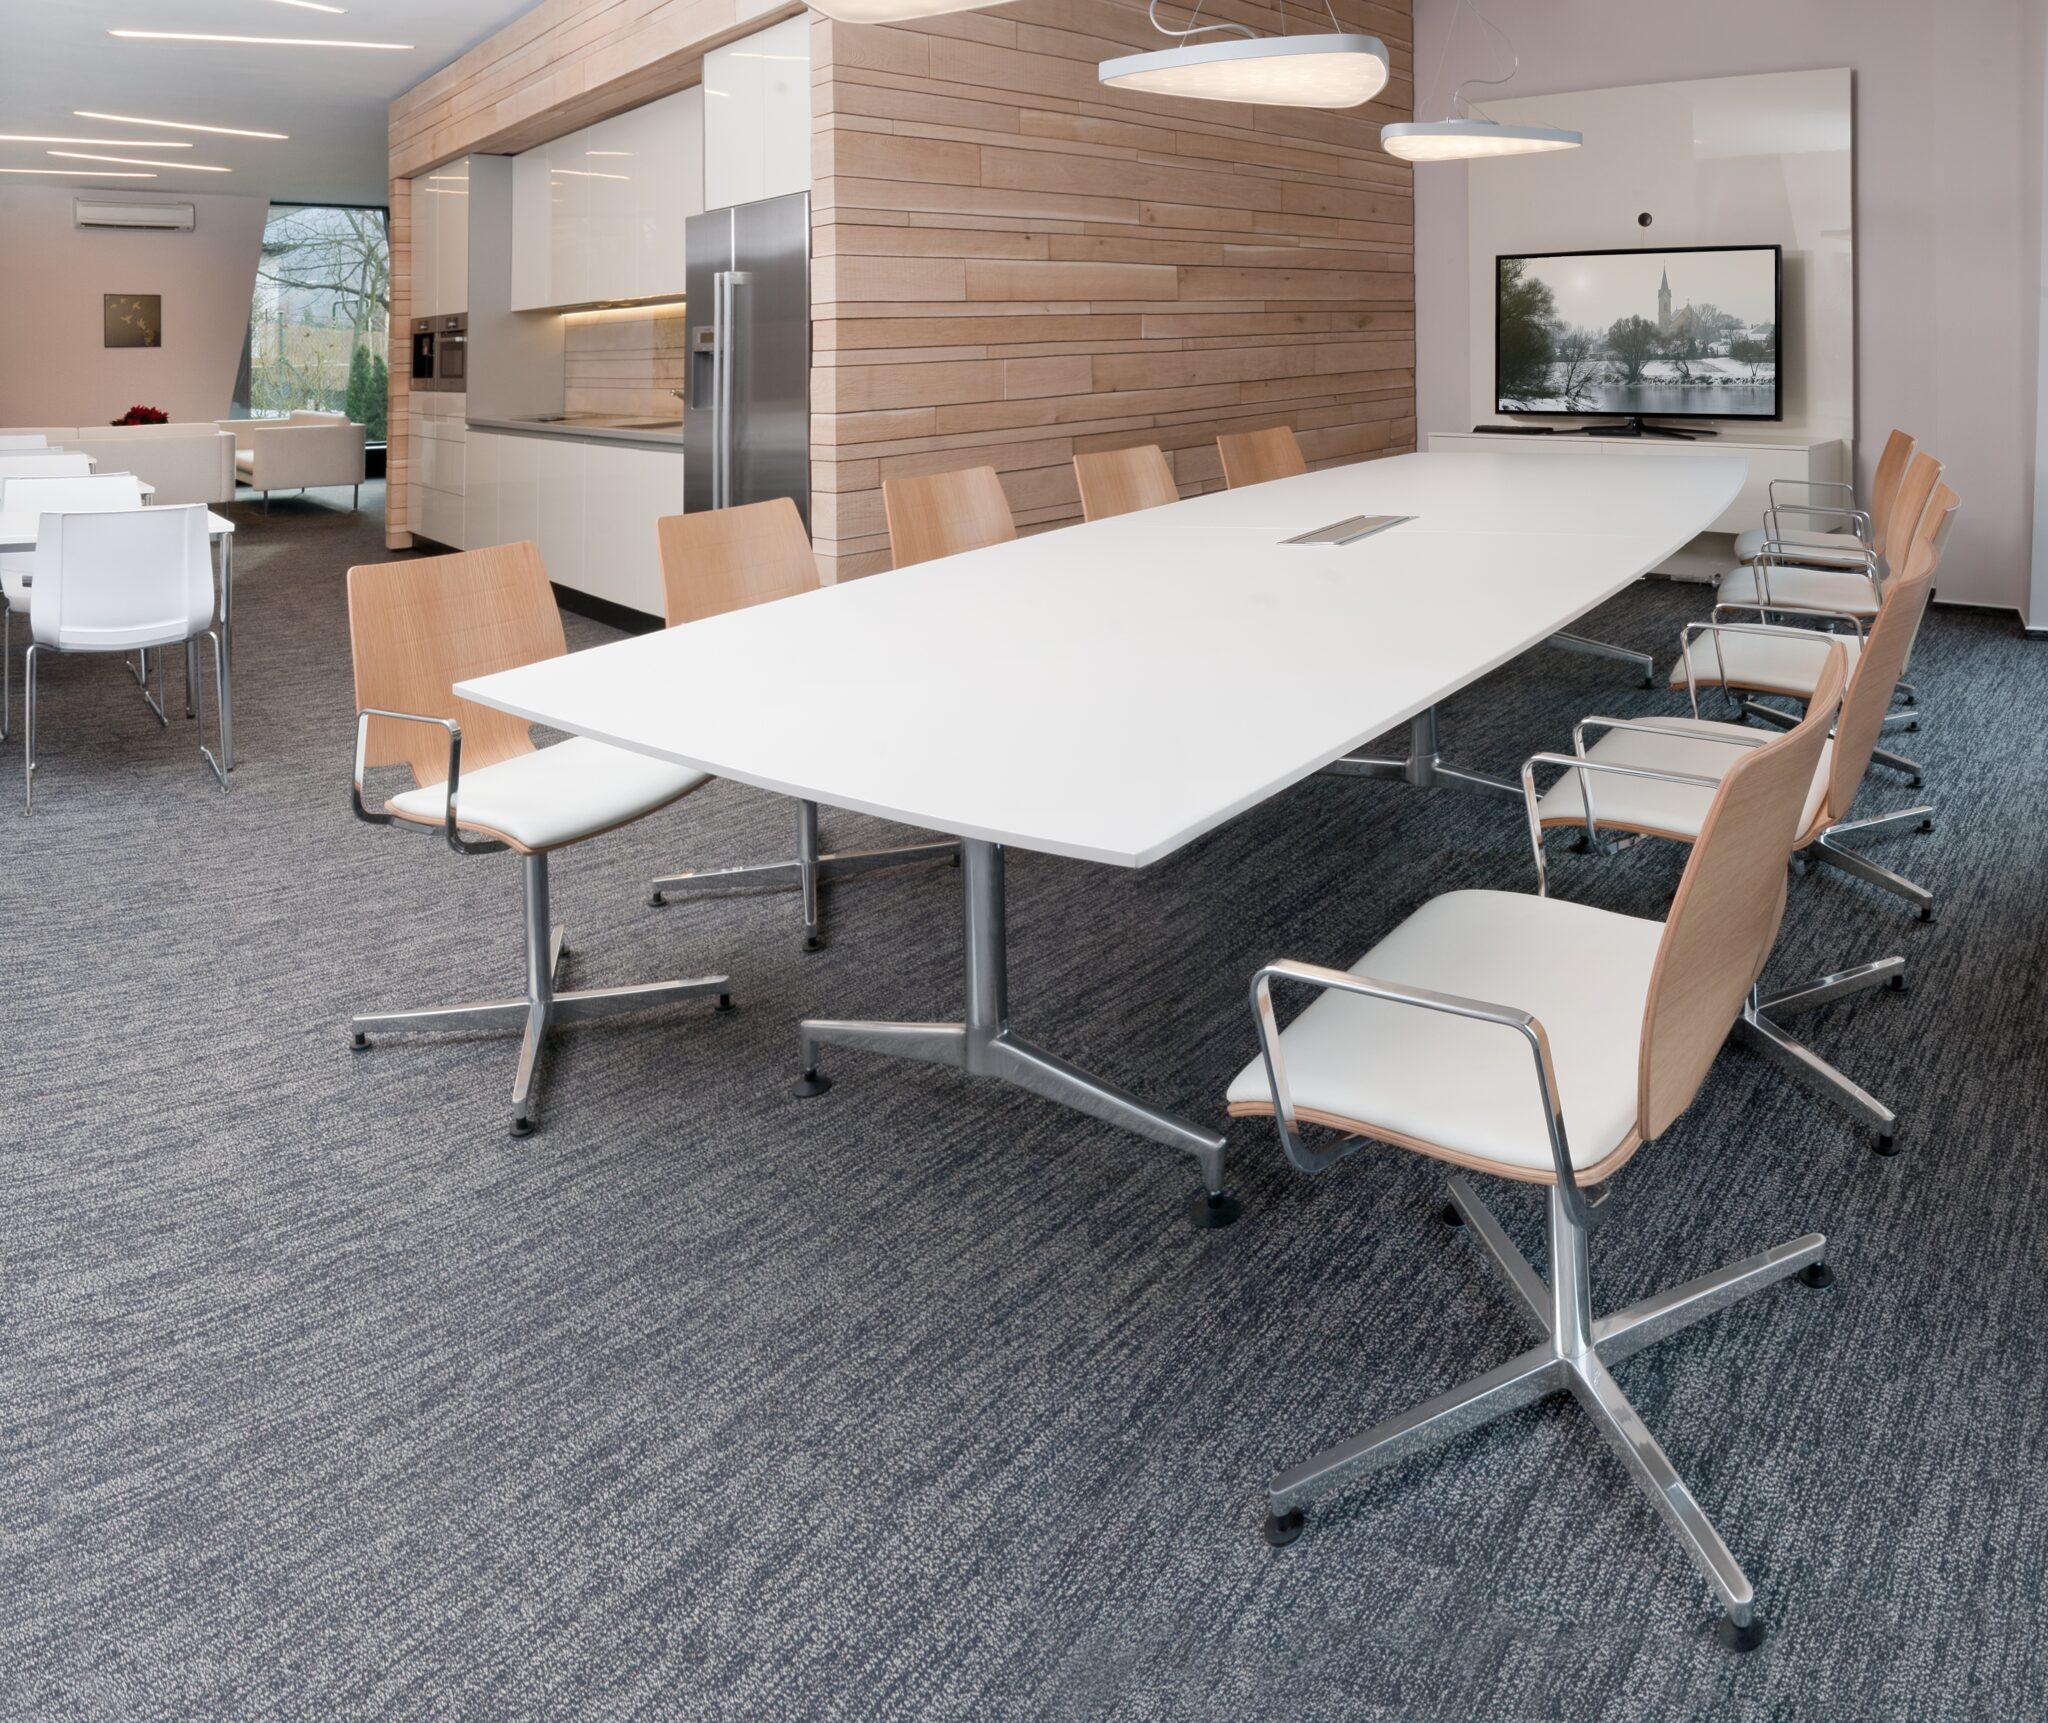 Kusch+Co kantoormeubilair Den haag vergadertafel Heering Office